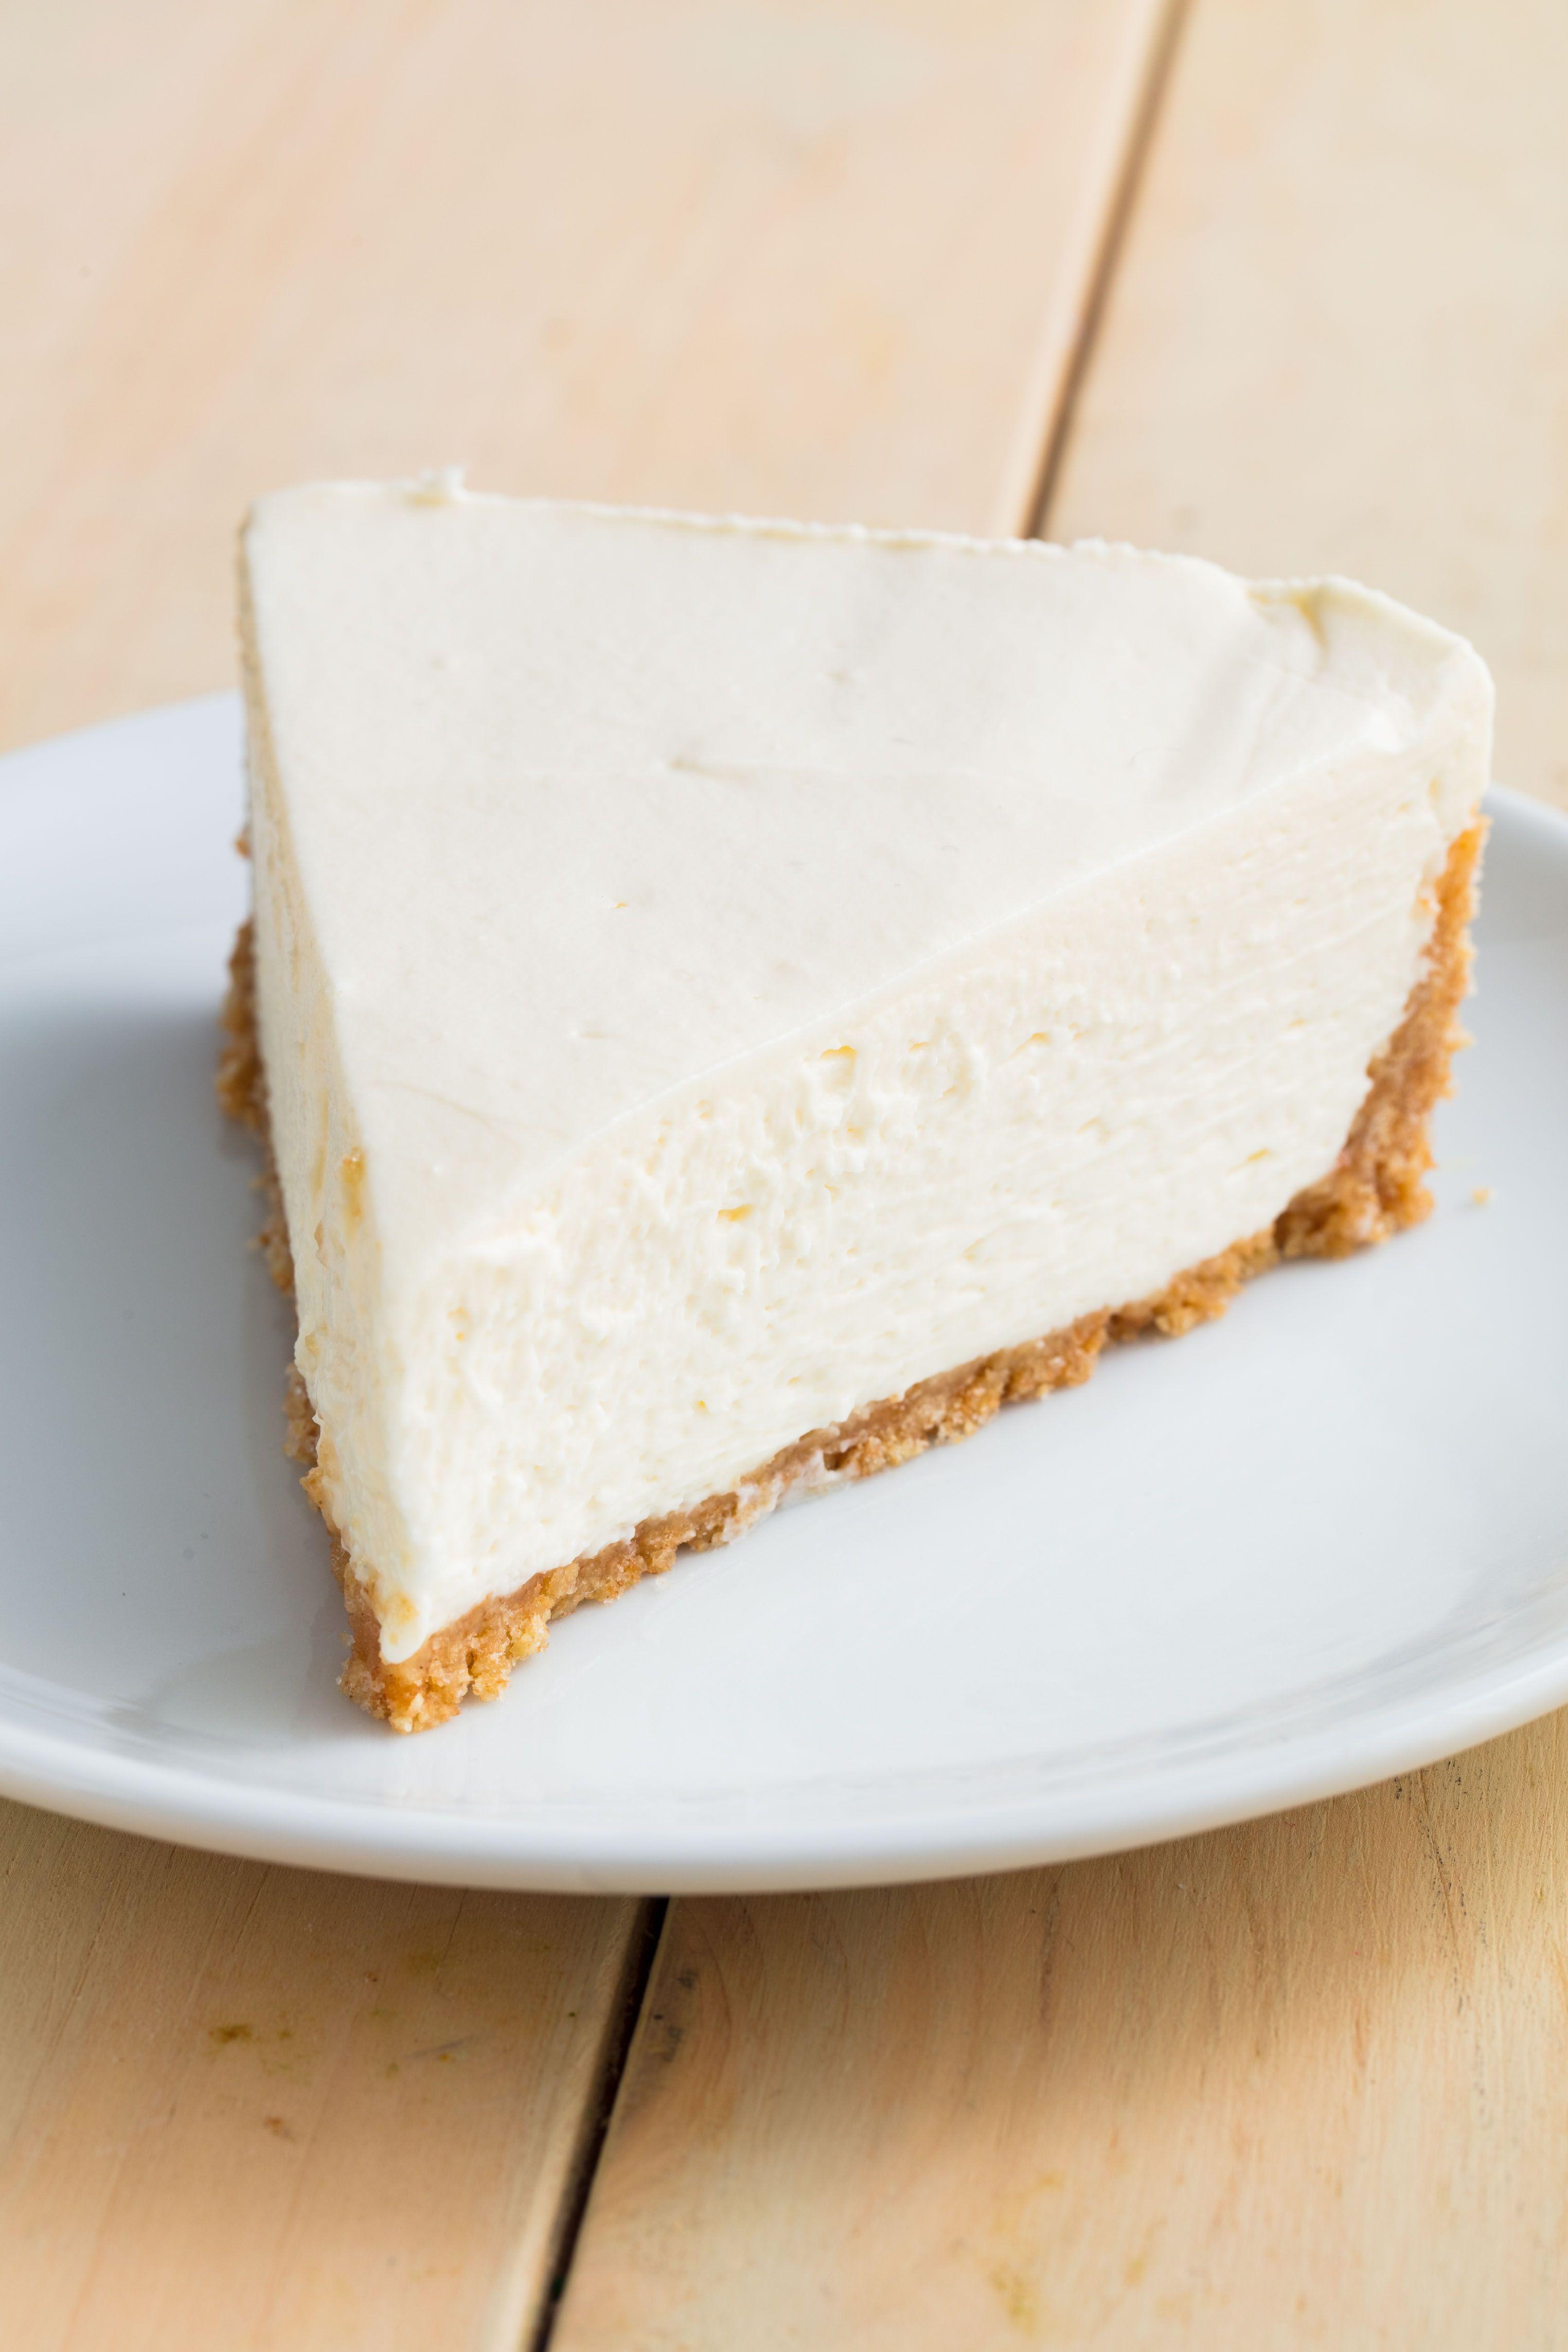 70+ Easy No Bake Desserts - Recipes for Last Minute Dessert